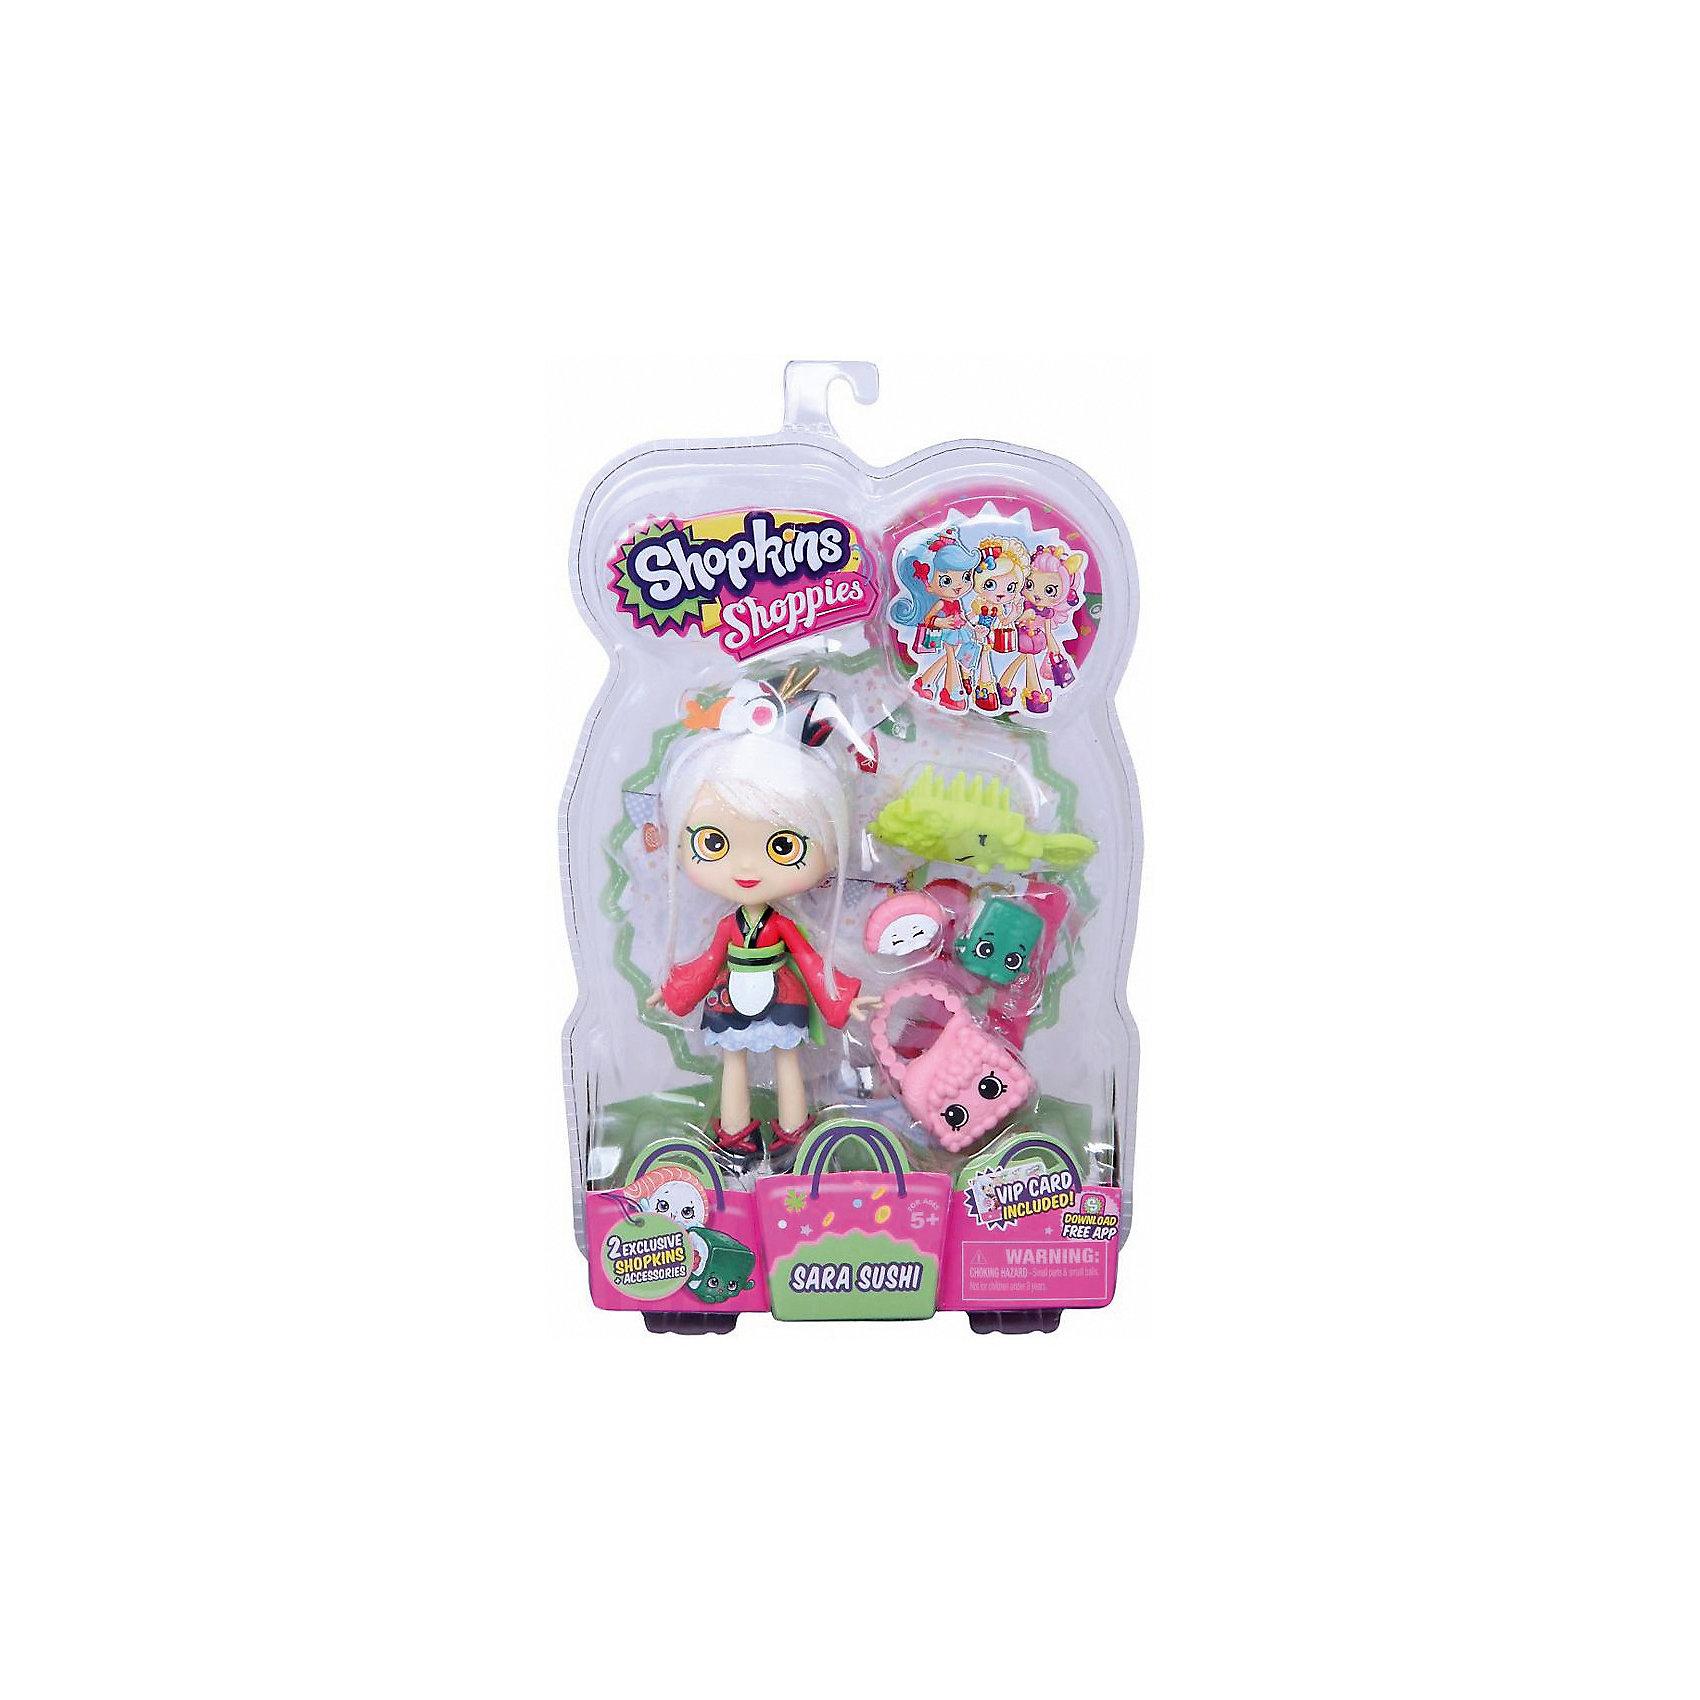 Moose Кукла Сара-Суши с аксессуарами, Shopkins куклы moose кукла